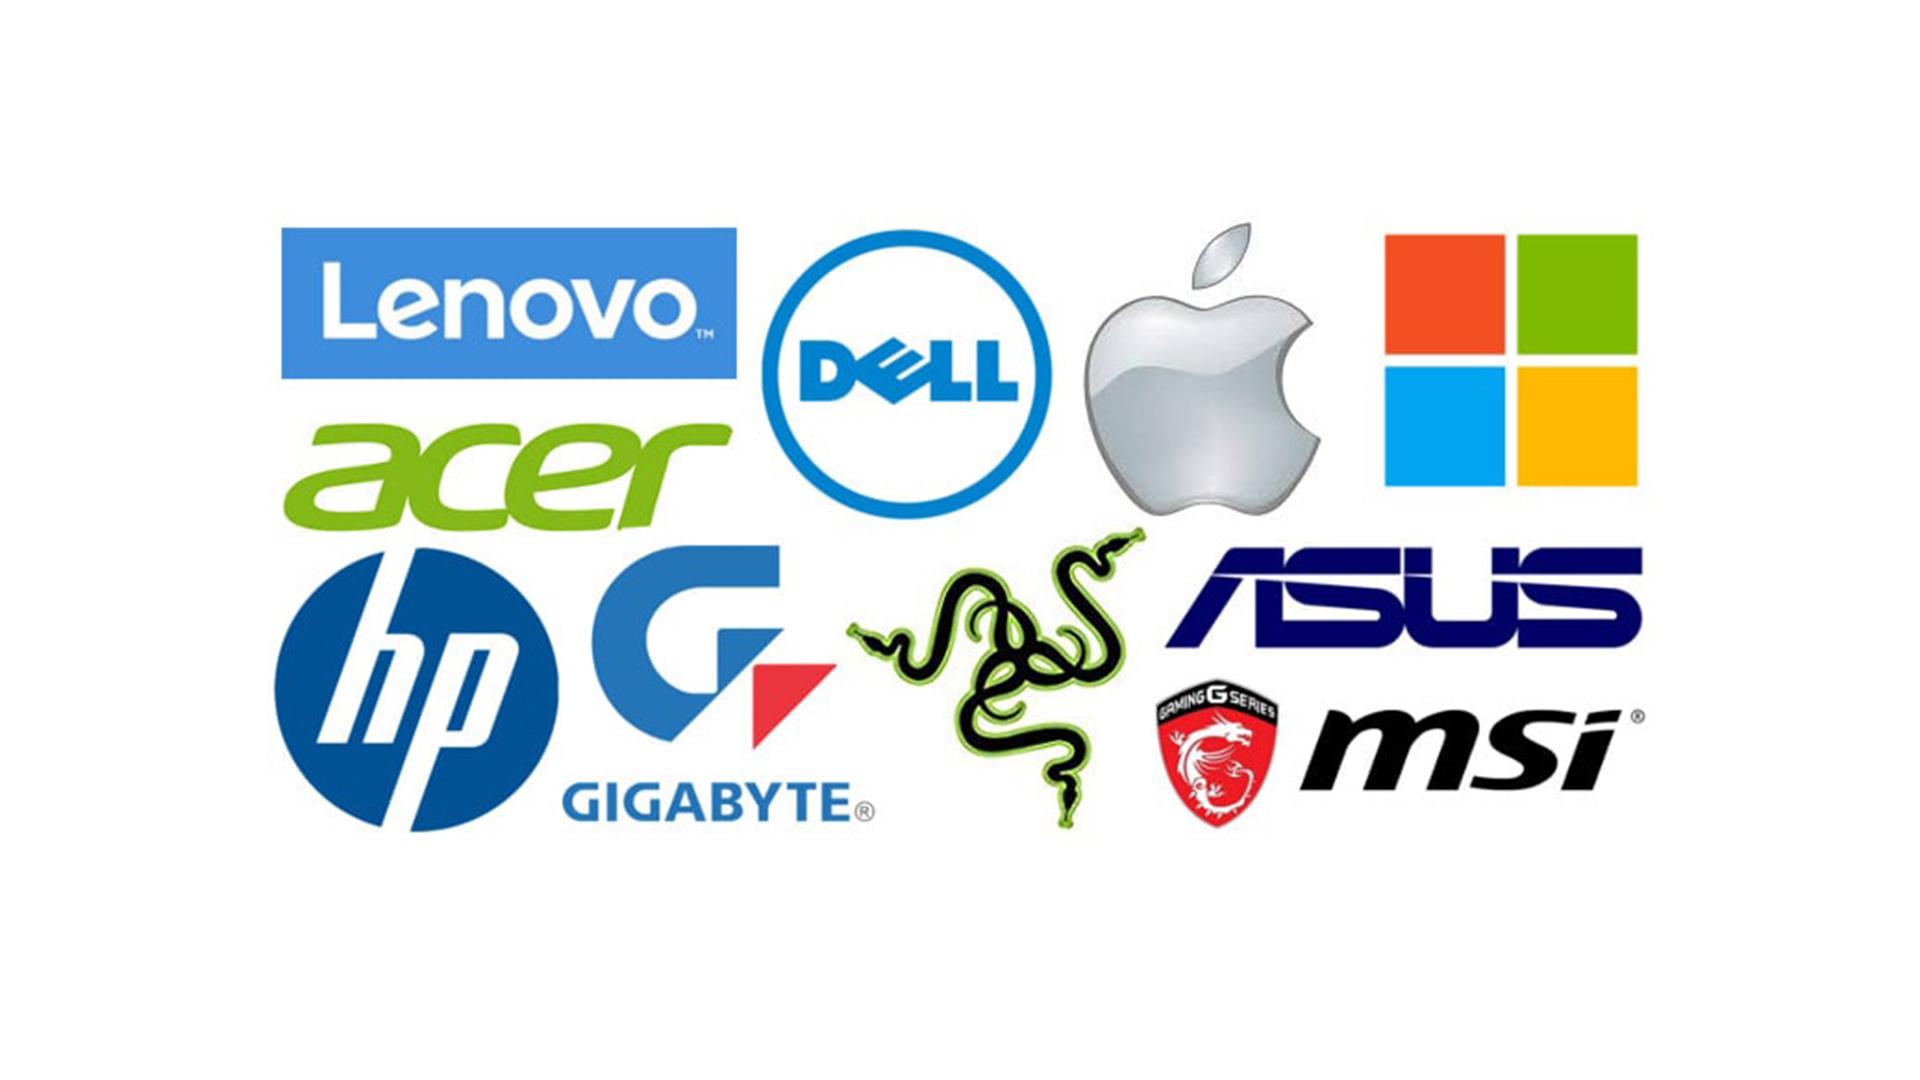 best-laptop-brand-jpg.11920